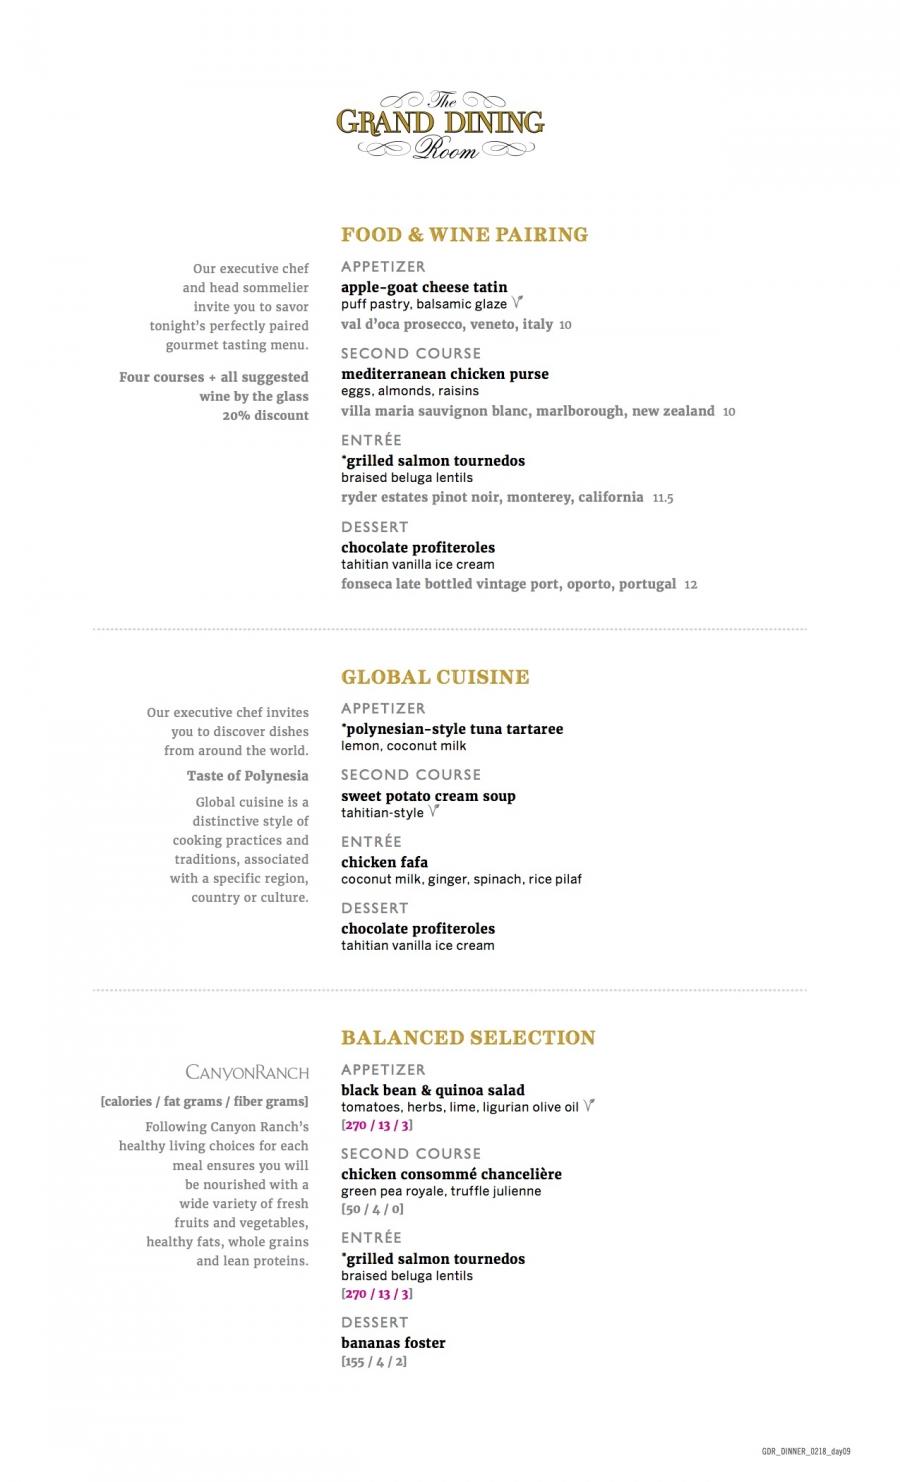 gdr_menu